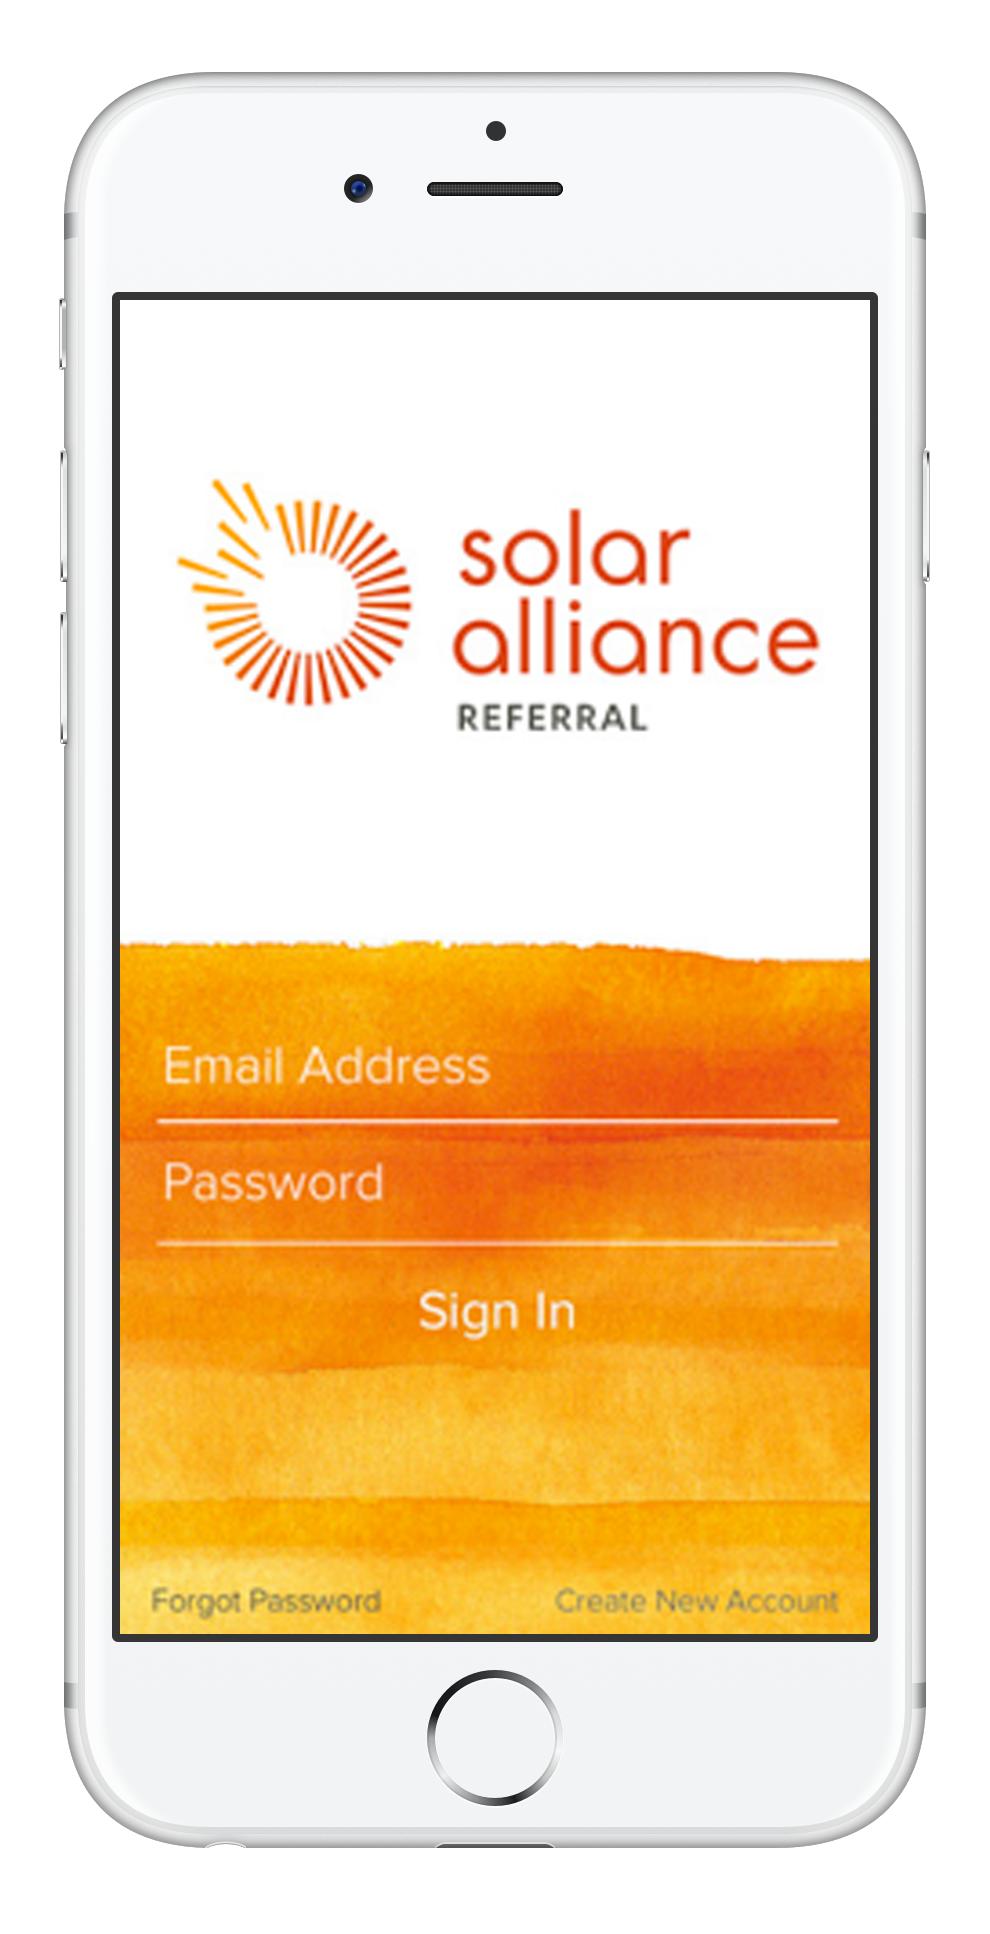 solar_alliance.png